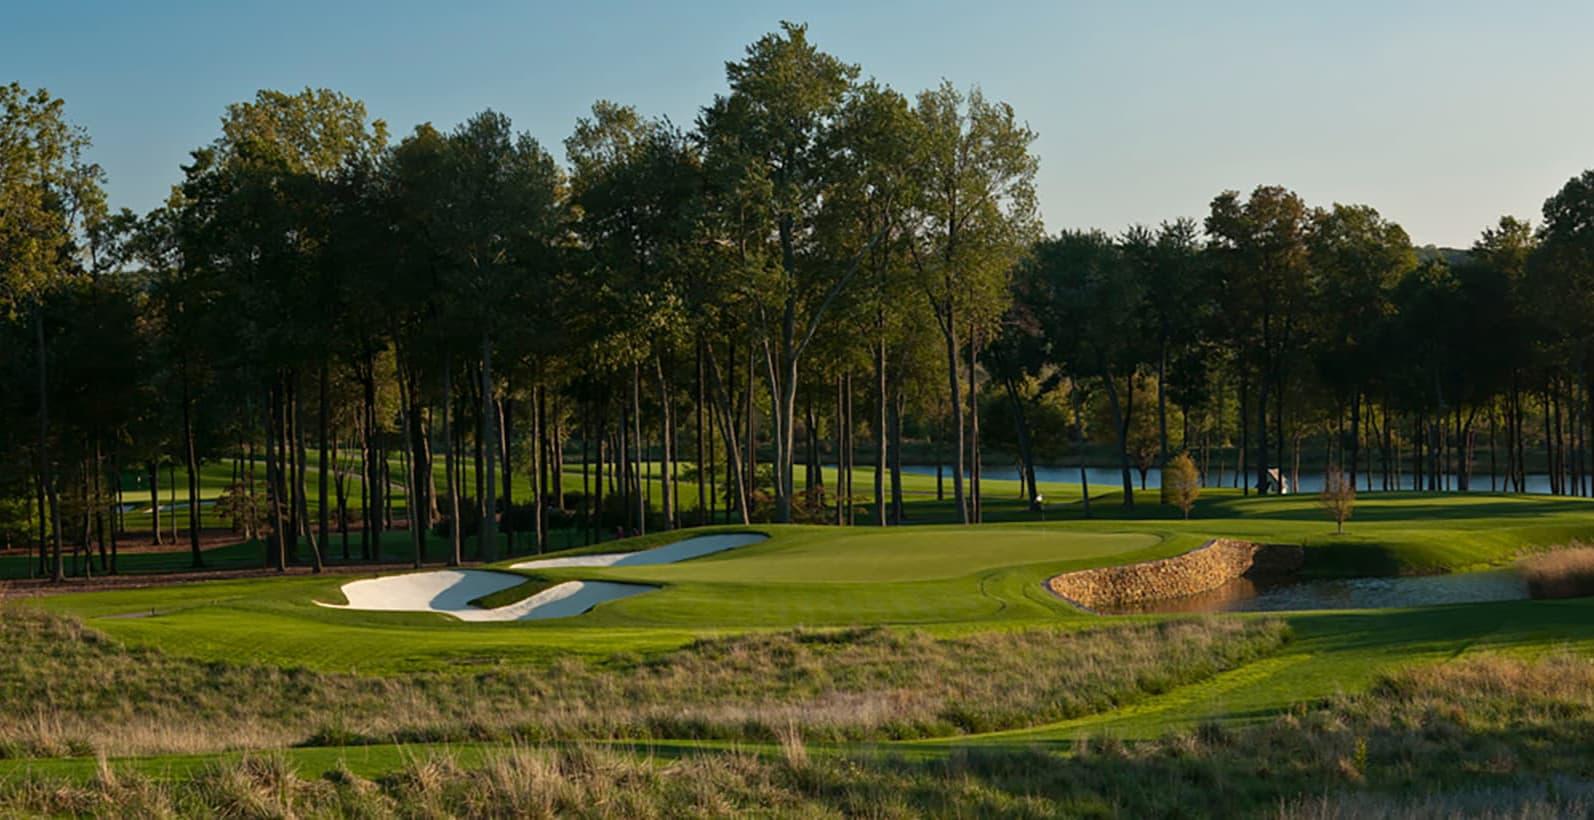 bmw golf championship 2021